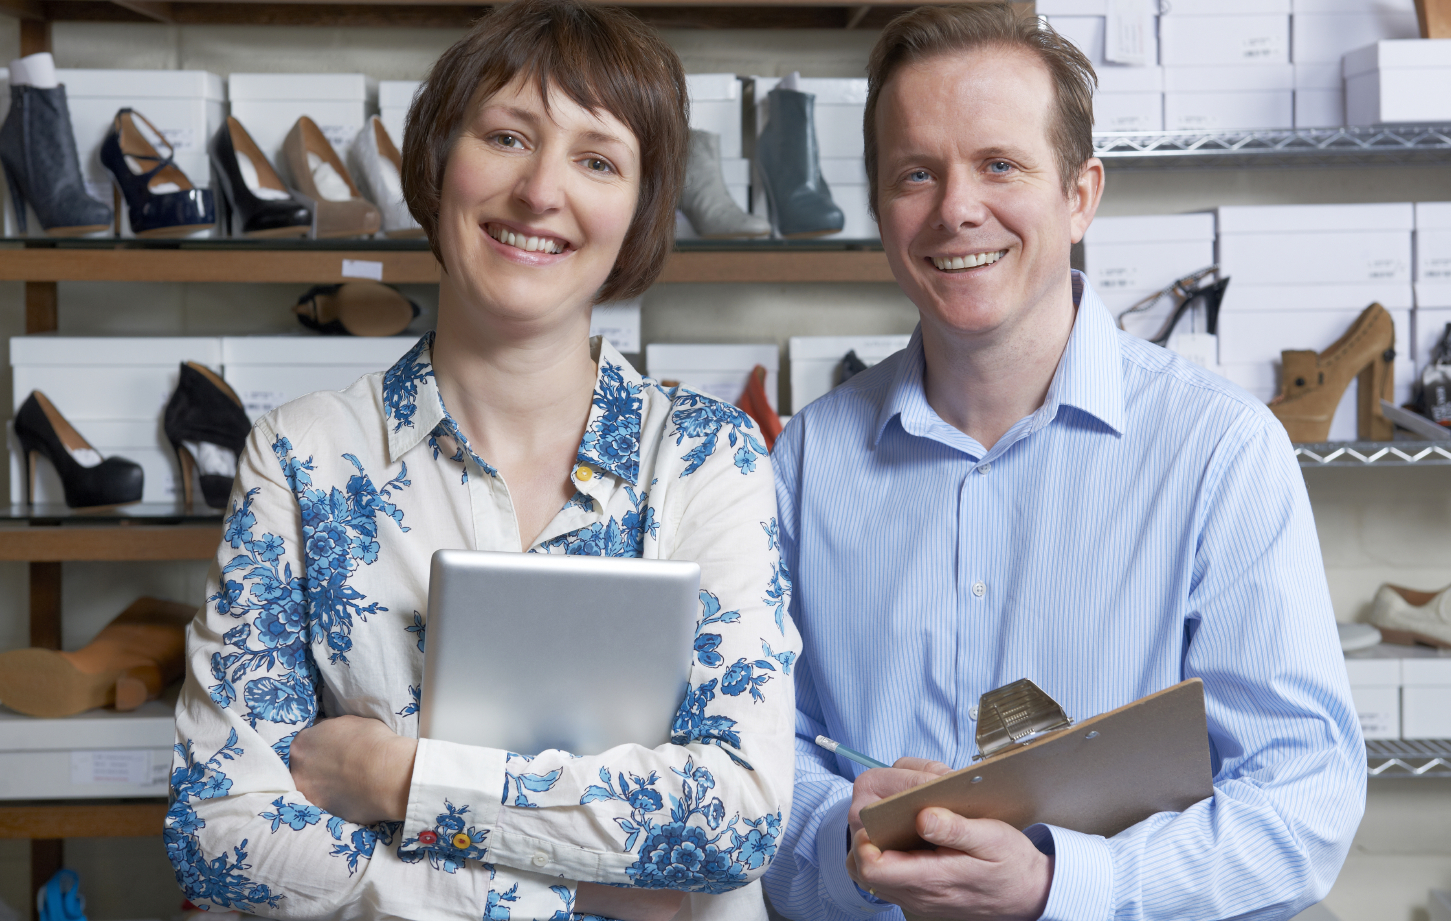 Couple Running Online Shoe Business